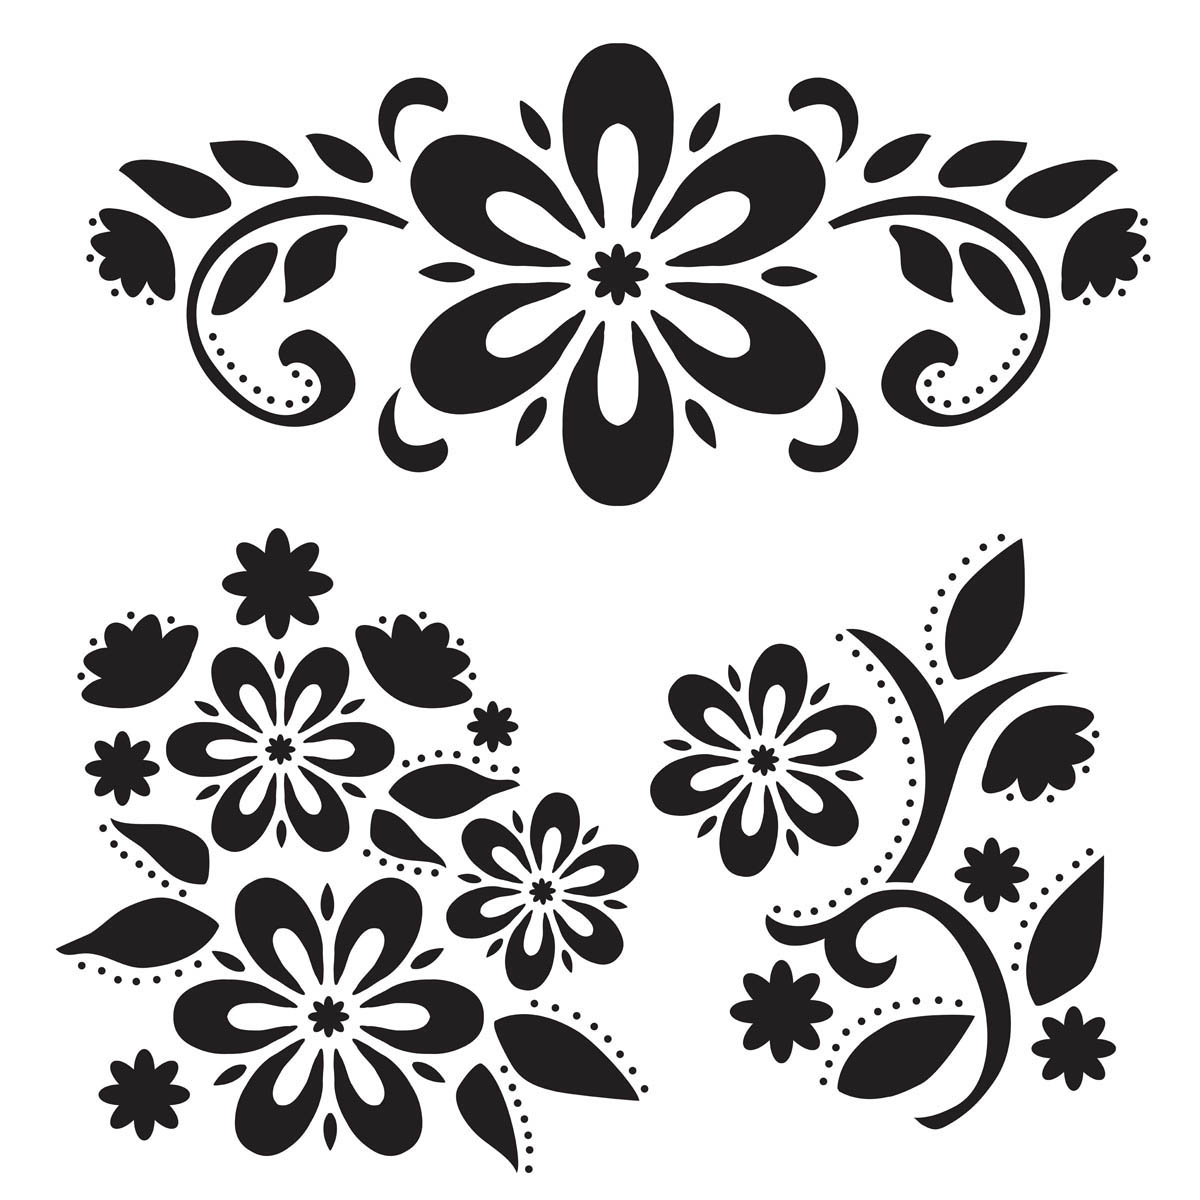 FolkArt ® Painting Stencils - Large - Debbie's Floral - 30599